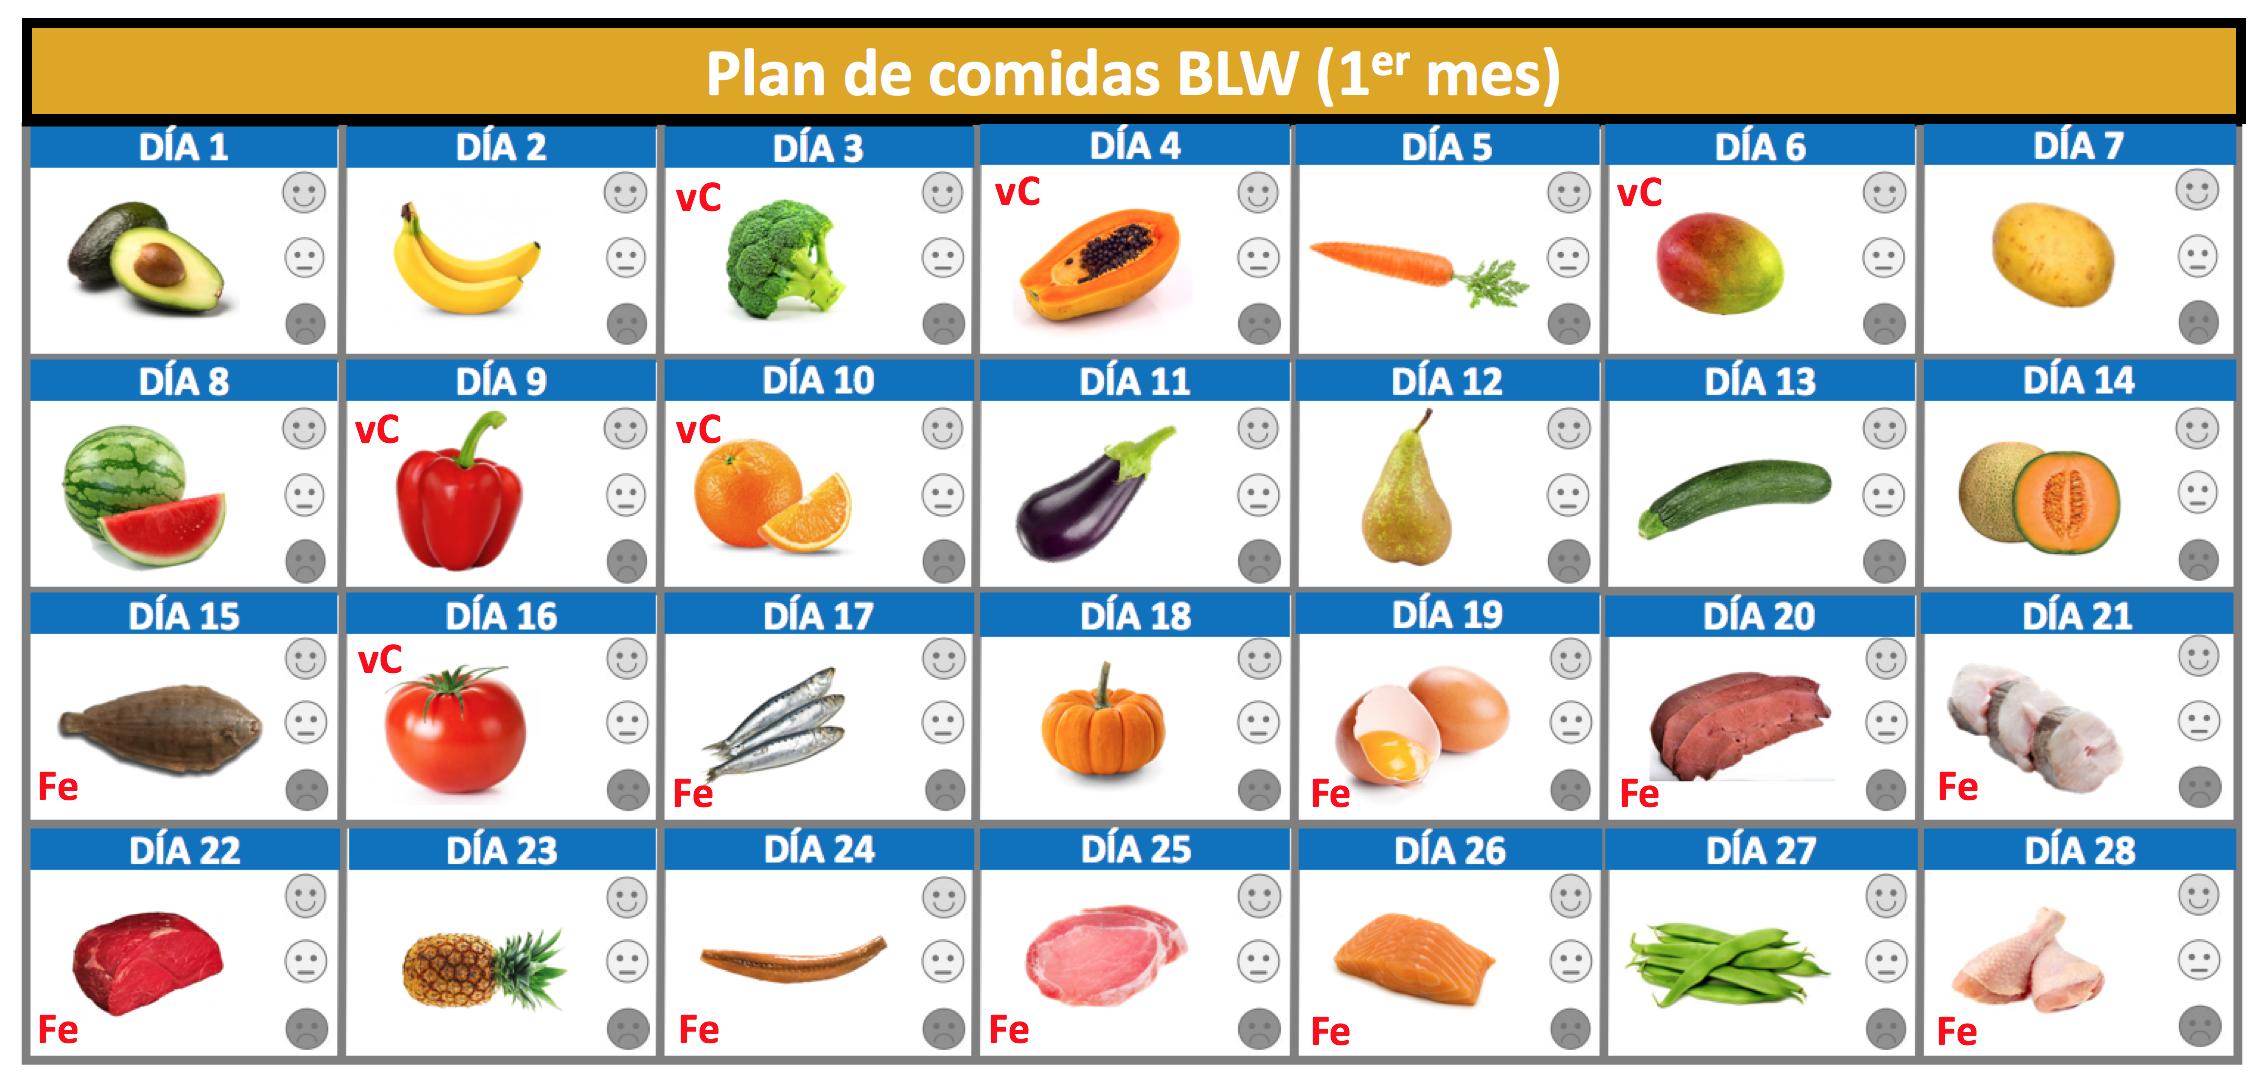 Plan alimentos blw 2